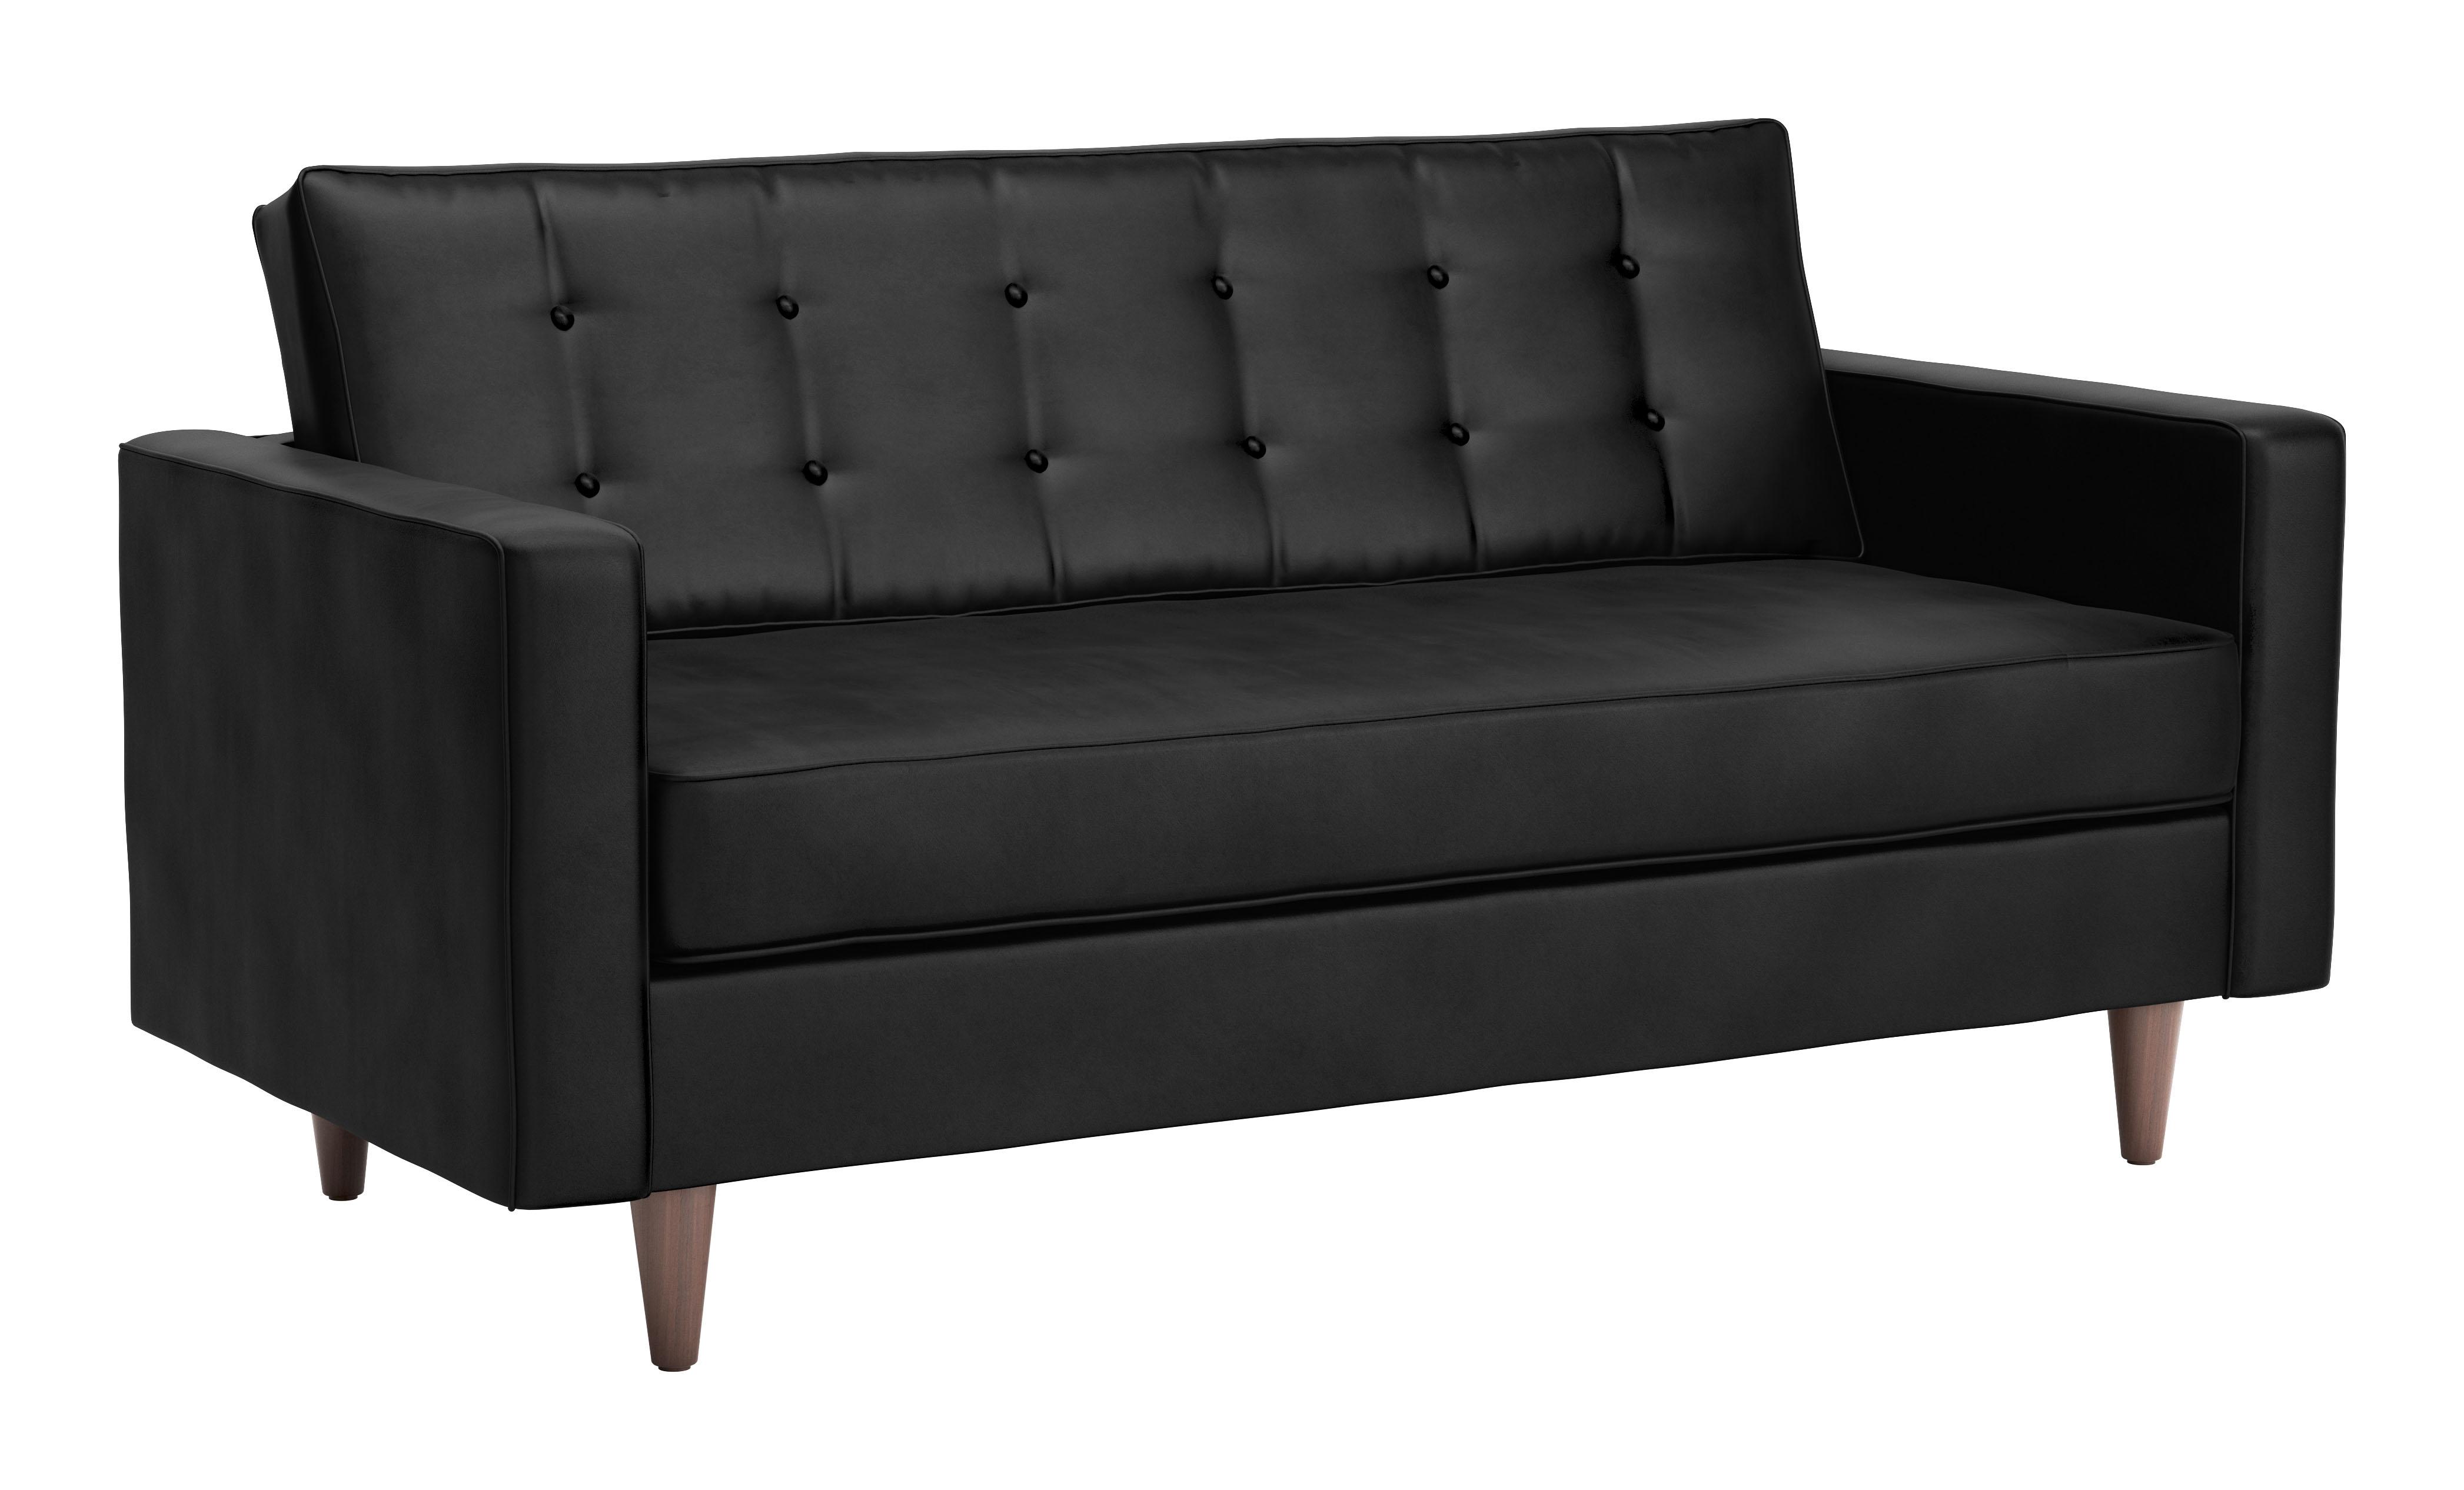 Super Puget Sofa Black Velvet By Zuo Modern Dailytribune Chair Design For Home Dailytribuneorg